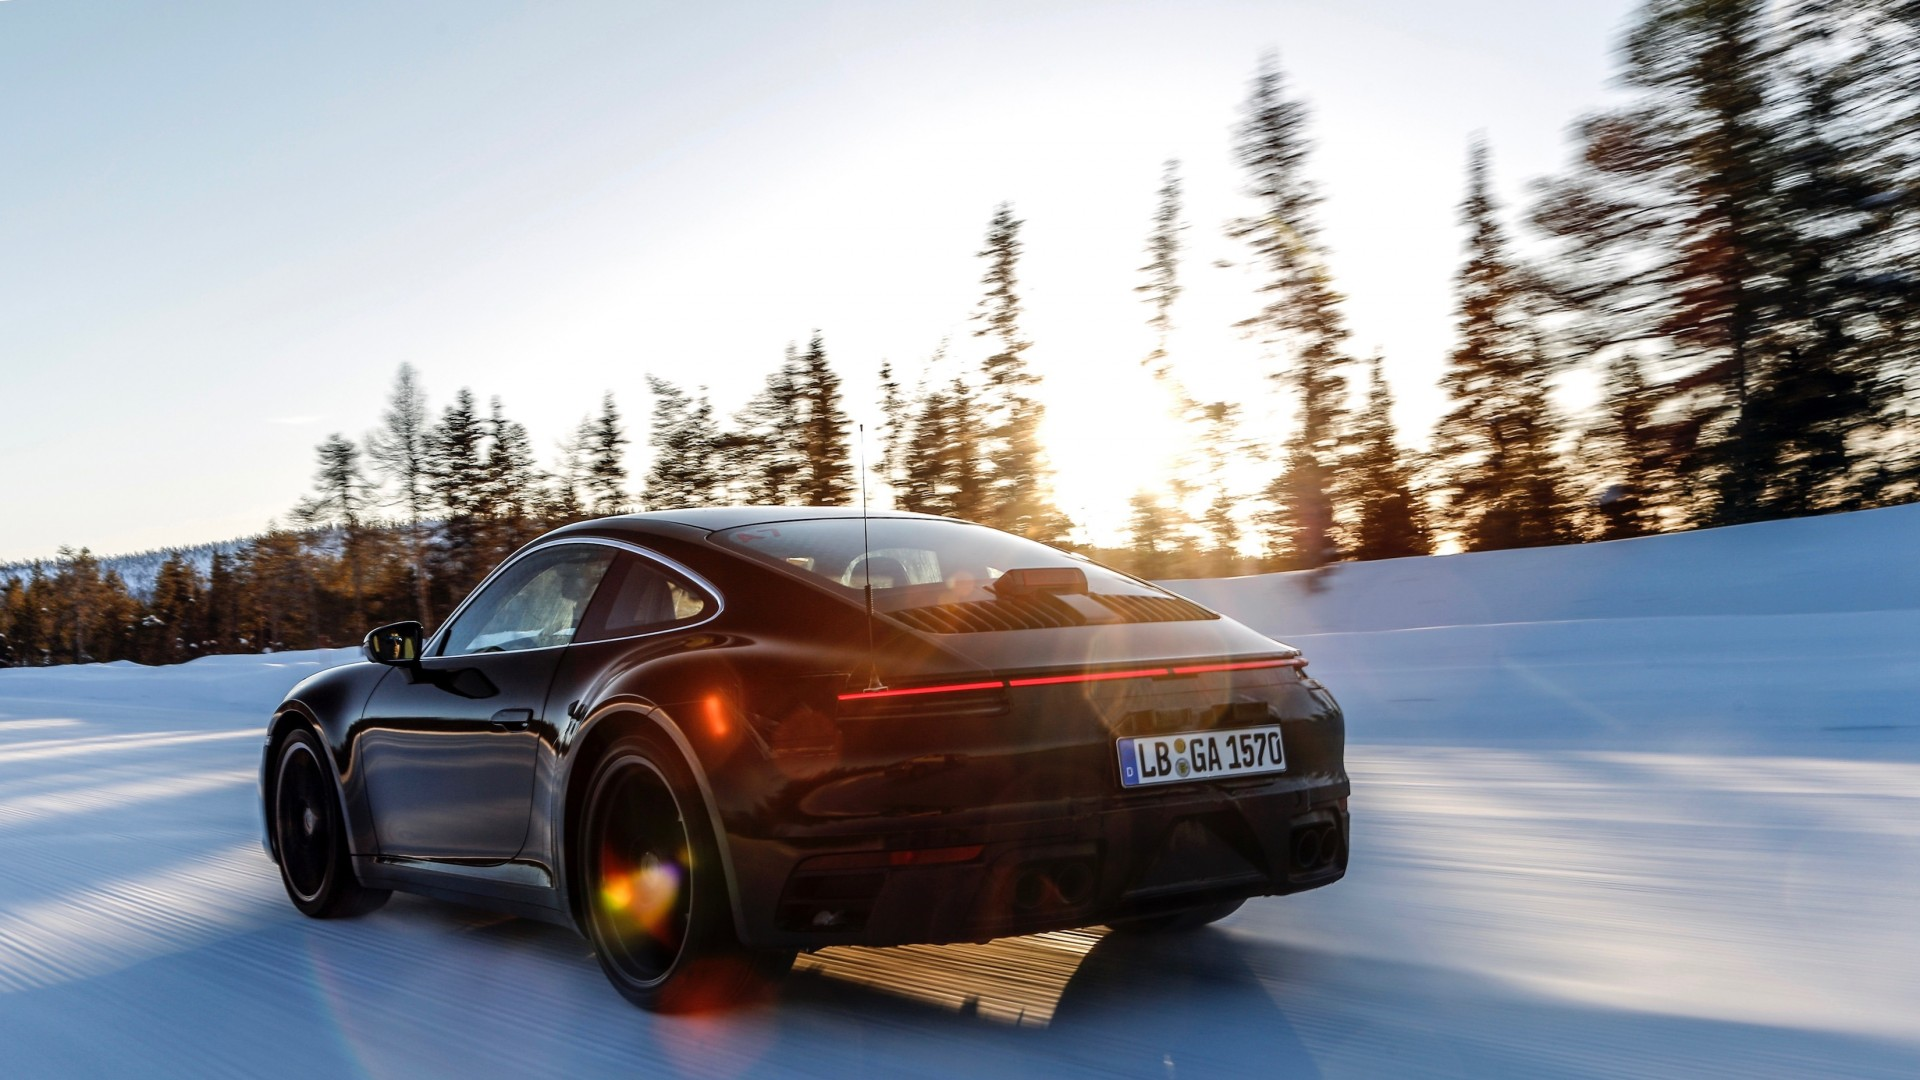 Wallpaper Porsche 911, 2020 Cars, 4K, Cars & Bikes #20873